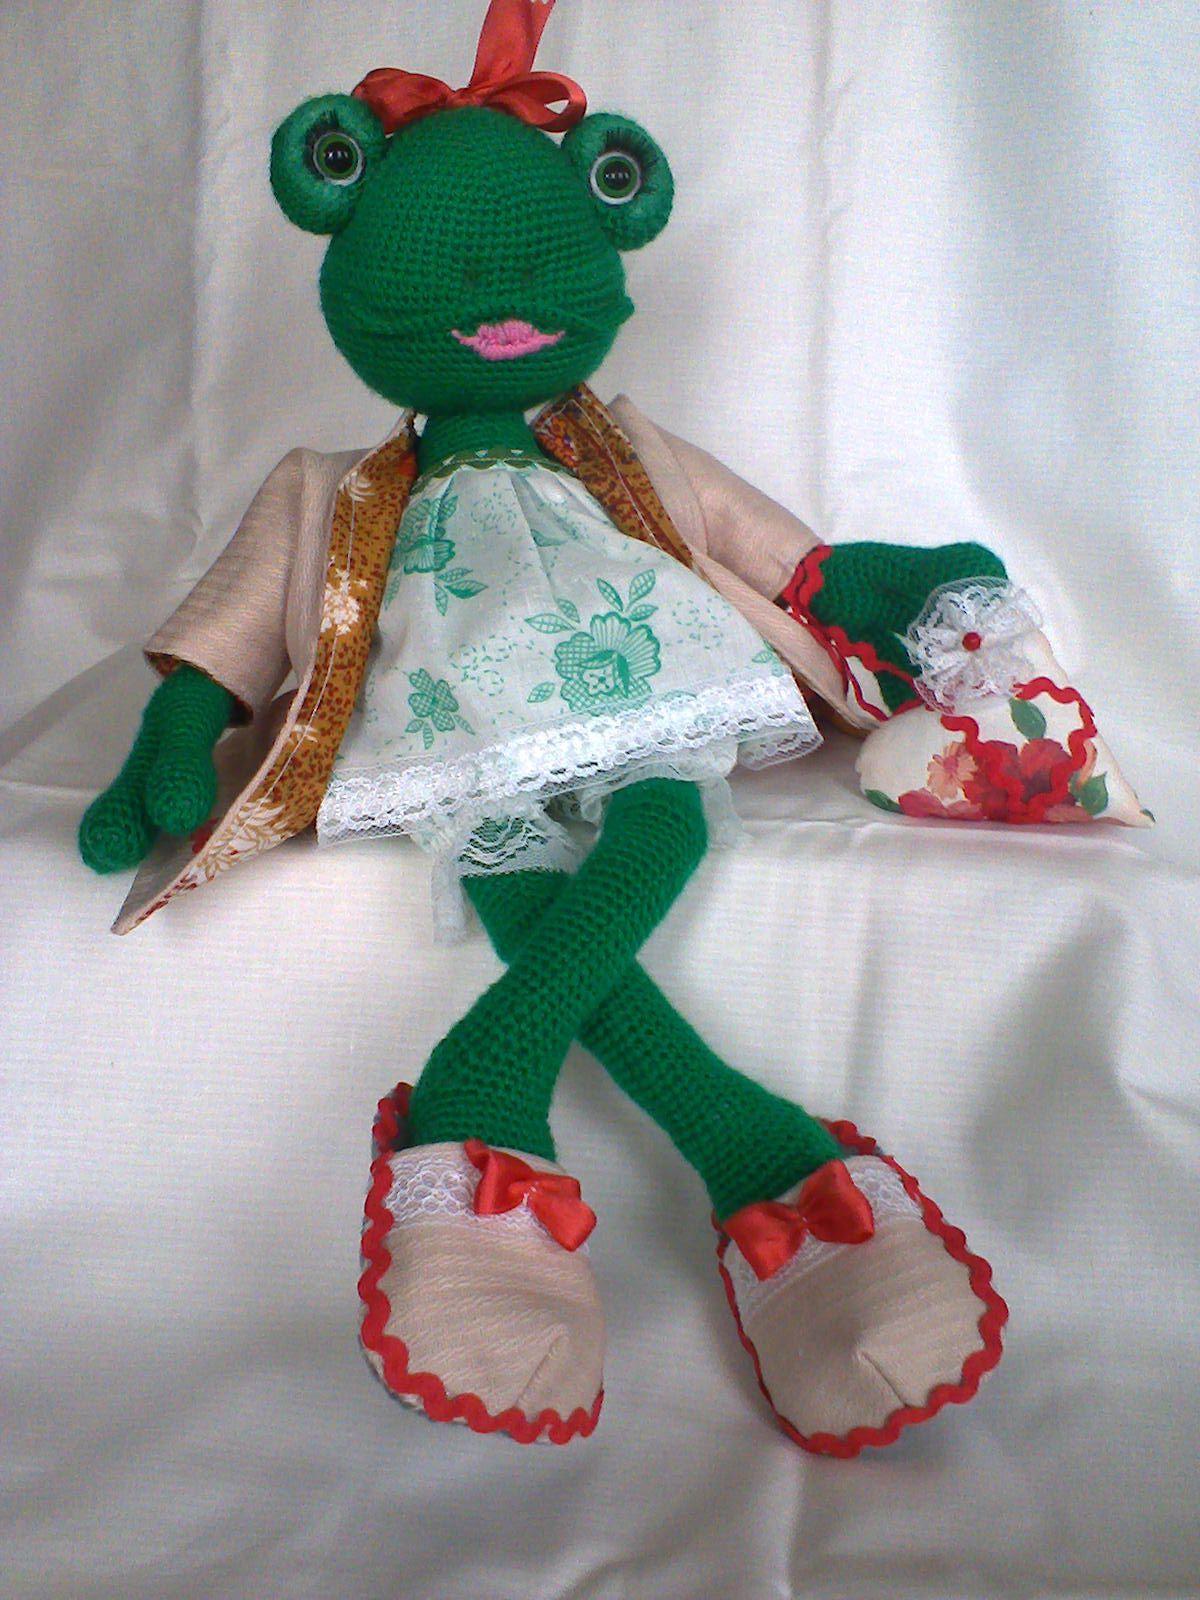 игроваякукла своимируками лягушка игрушкисвоимируками